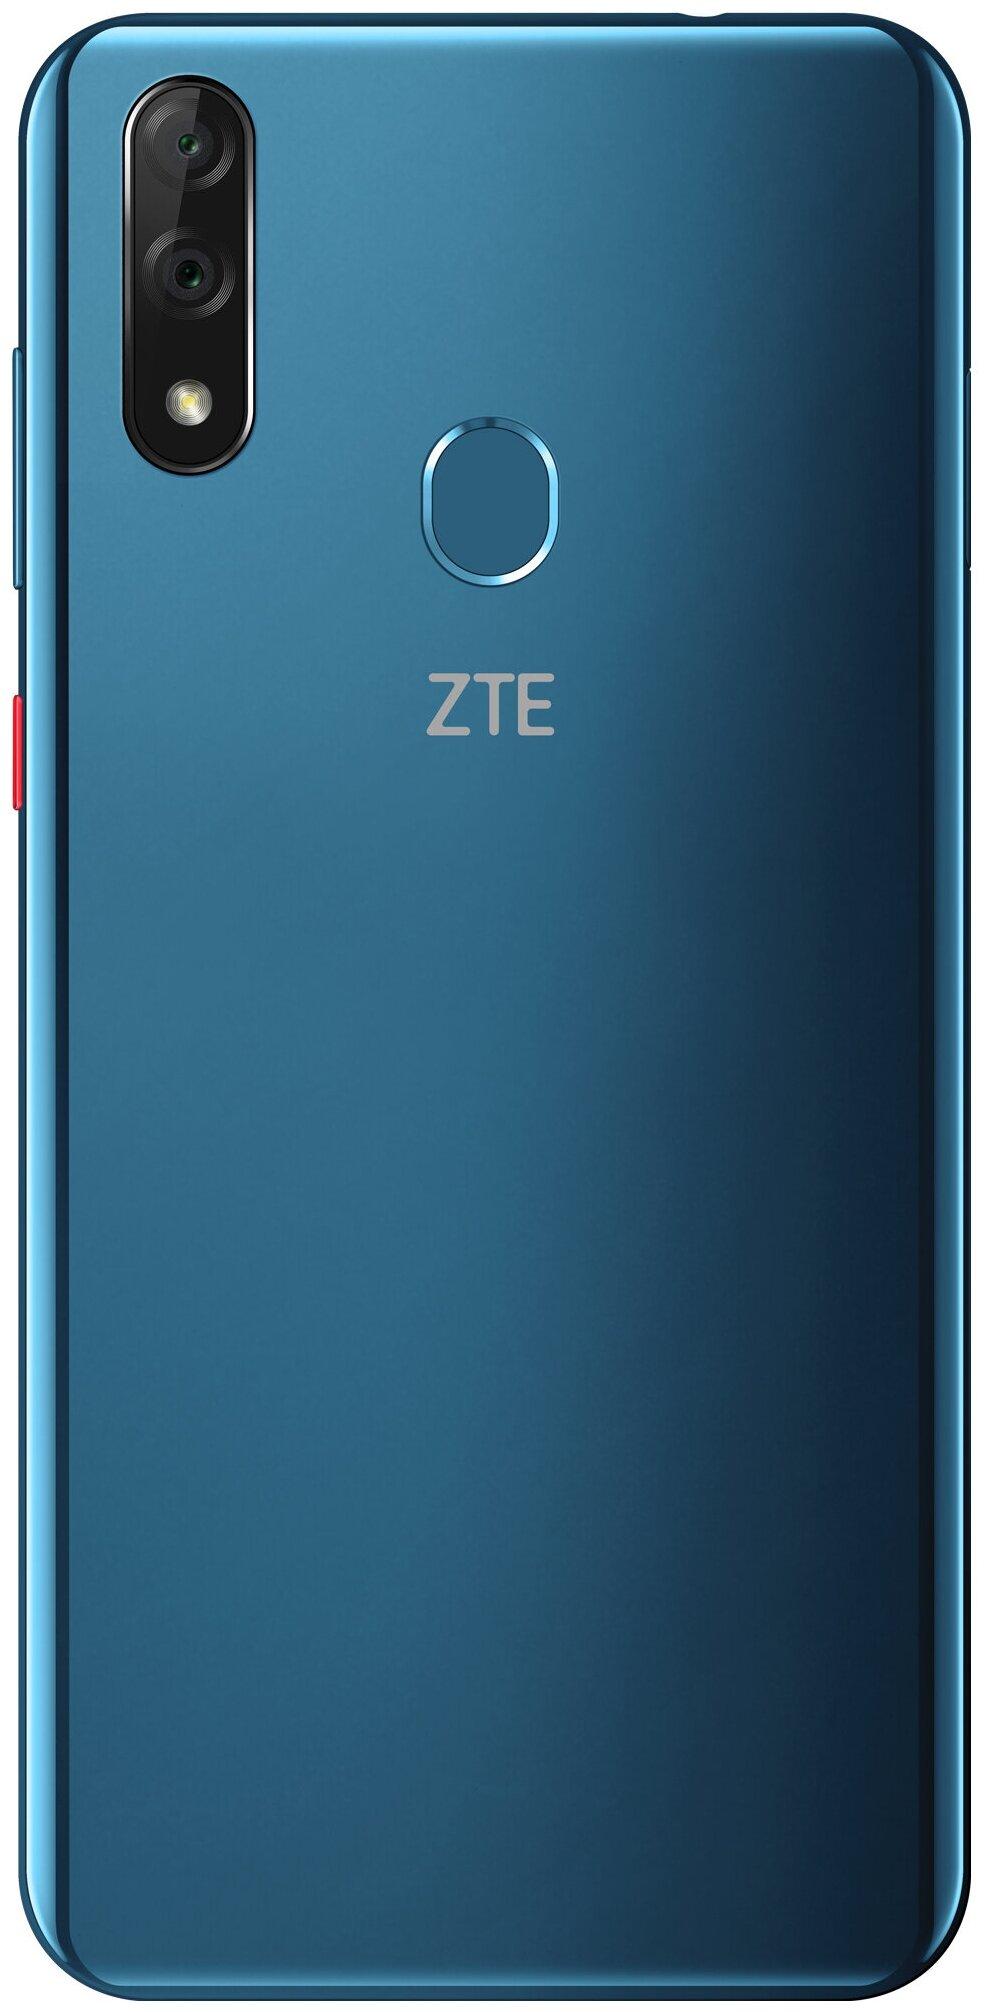 ZTE Blade V10 - интернет: 4G LTE